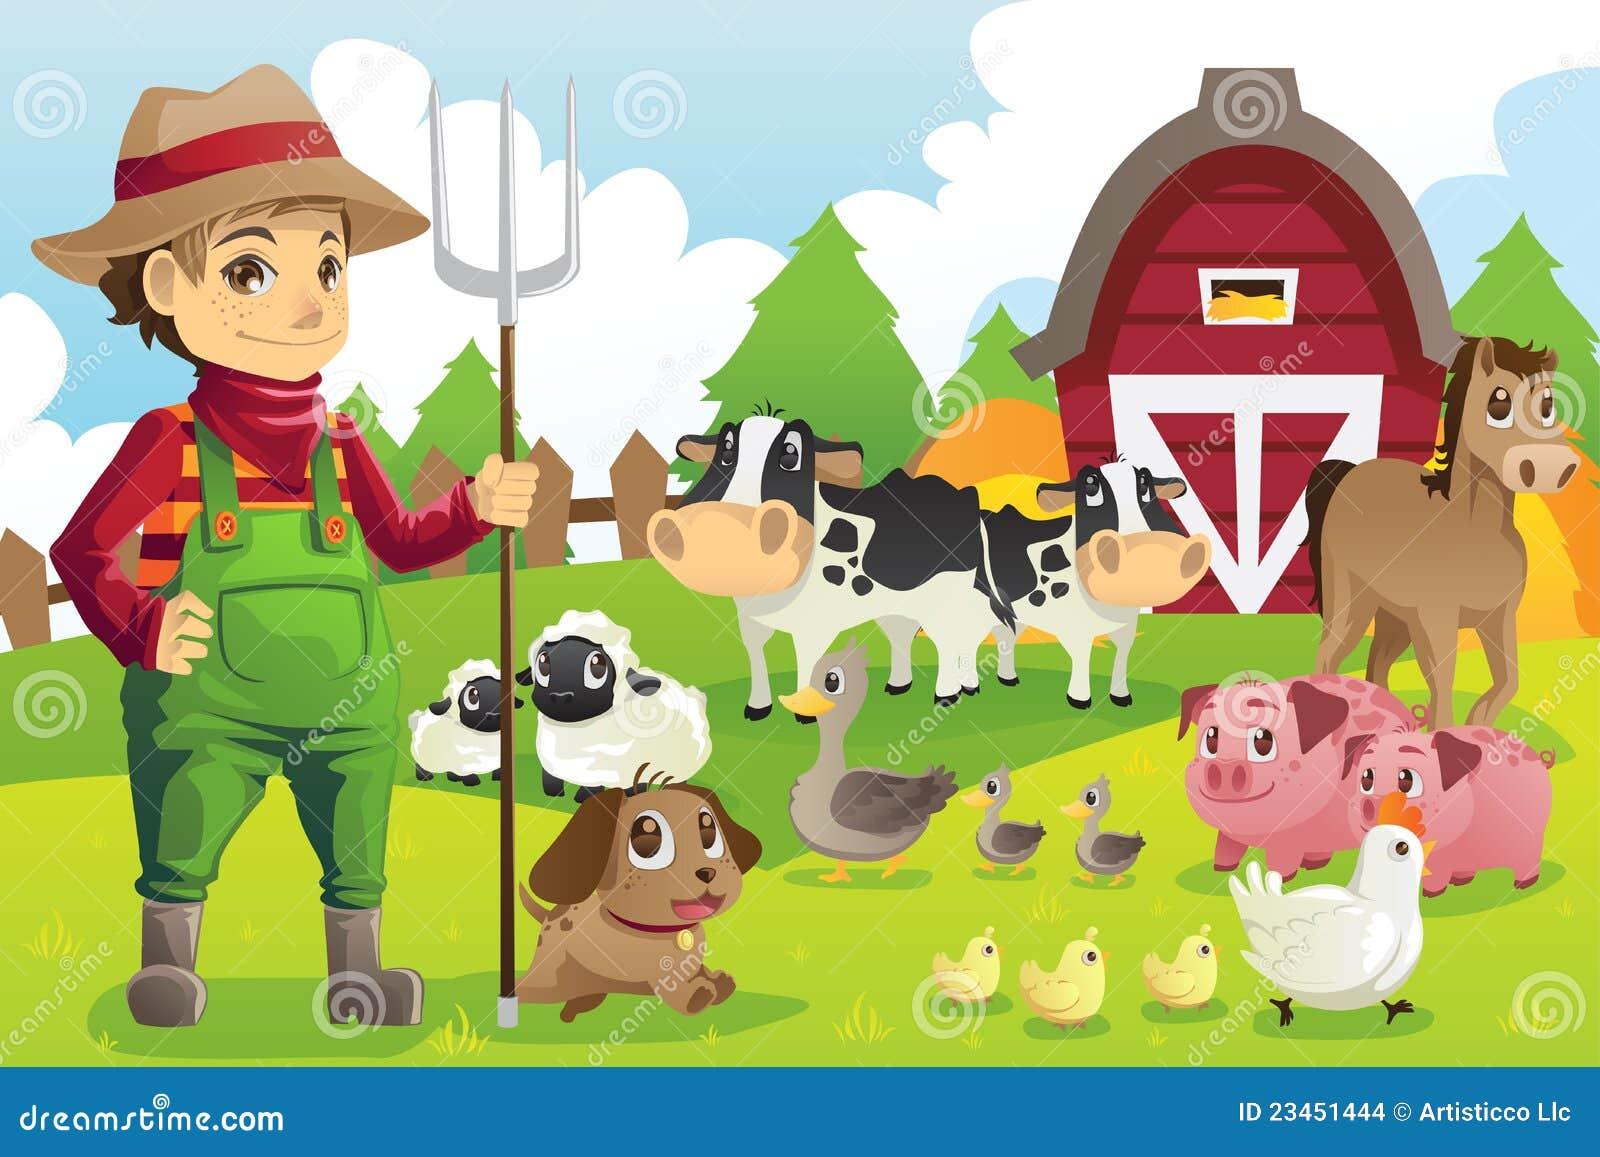 Farmer at the farm with animals